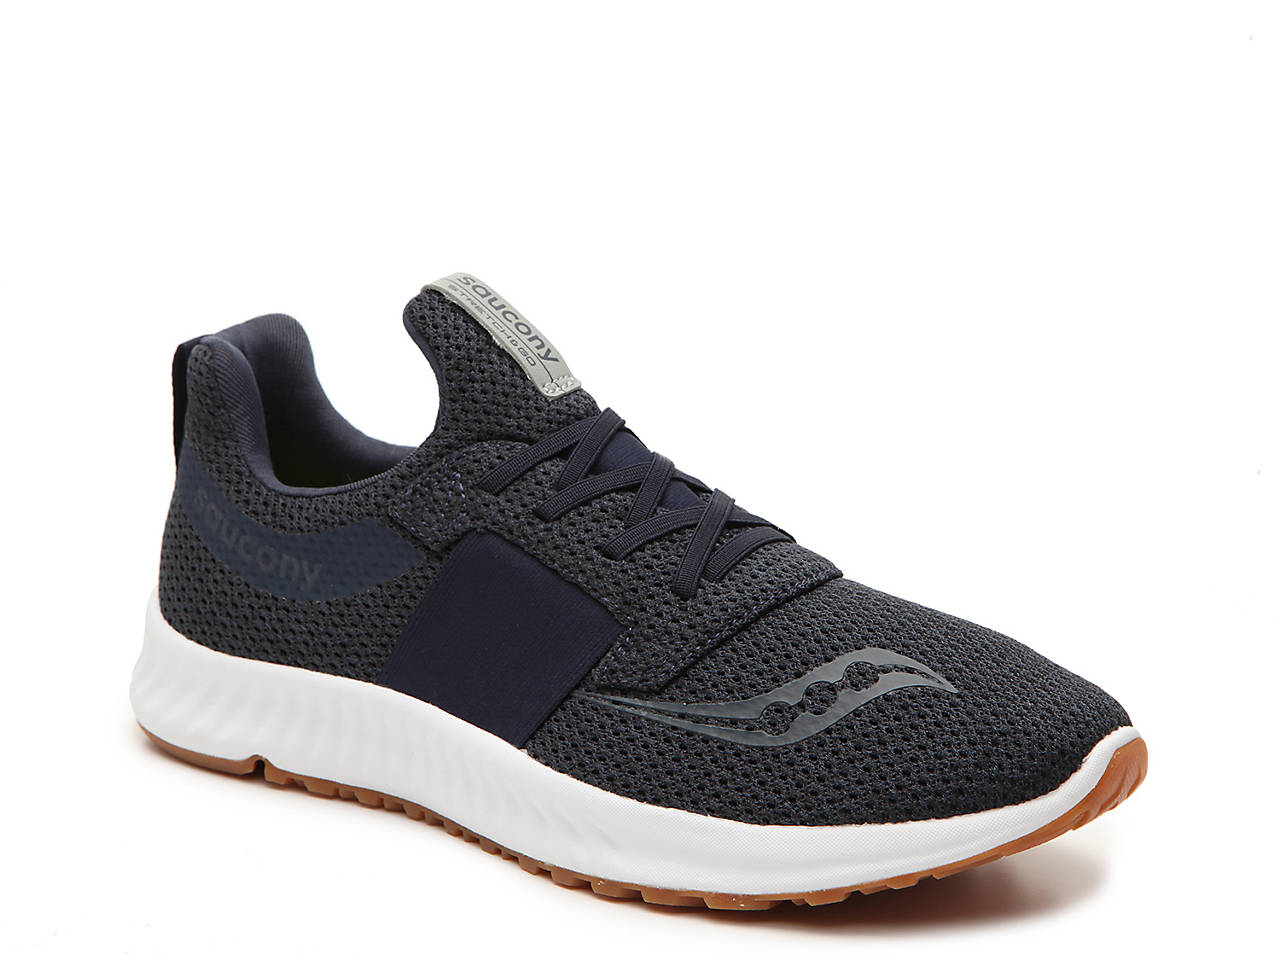 Stretch & Go Breeze Lightweight Slip On Sneaker Men's